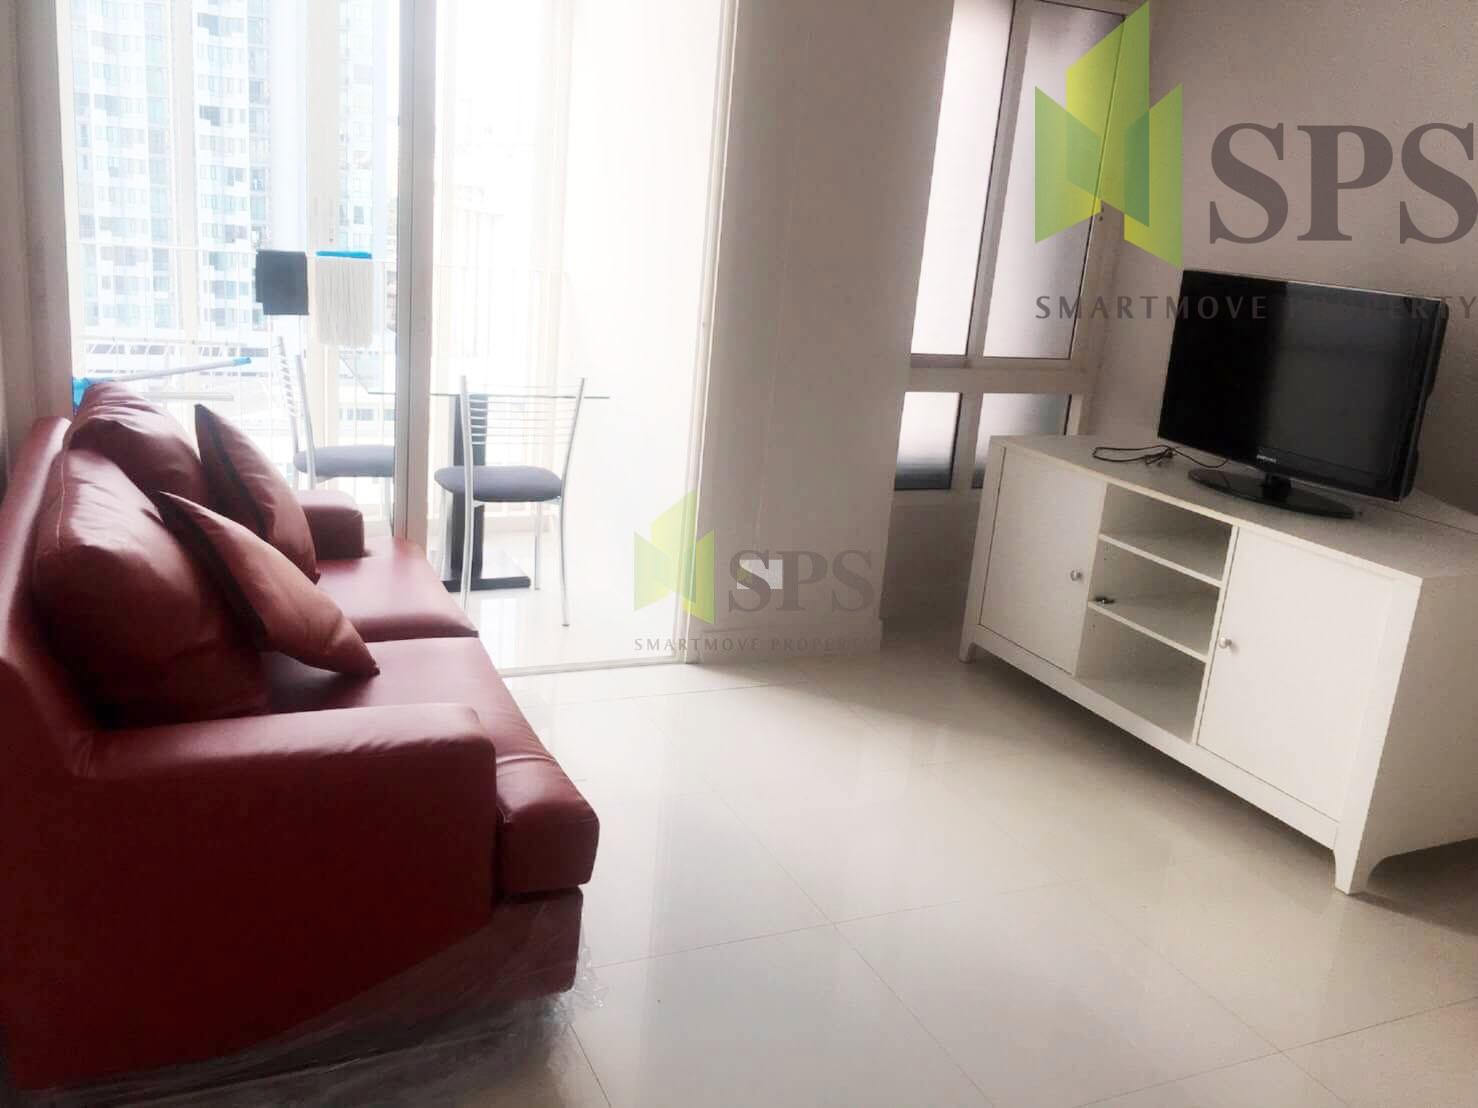 Ideo Verve Sukhumvit (ไอดีโอ เวิร์ฟ สุขุมวิท)Condo for Rent(SPSP136)